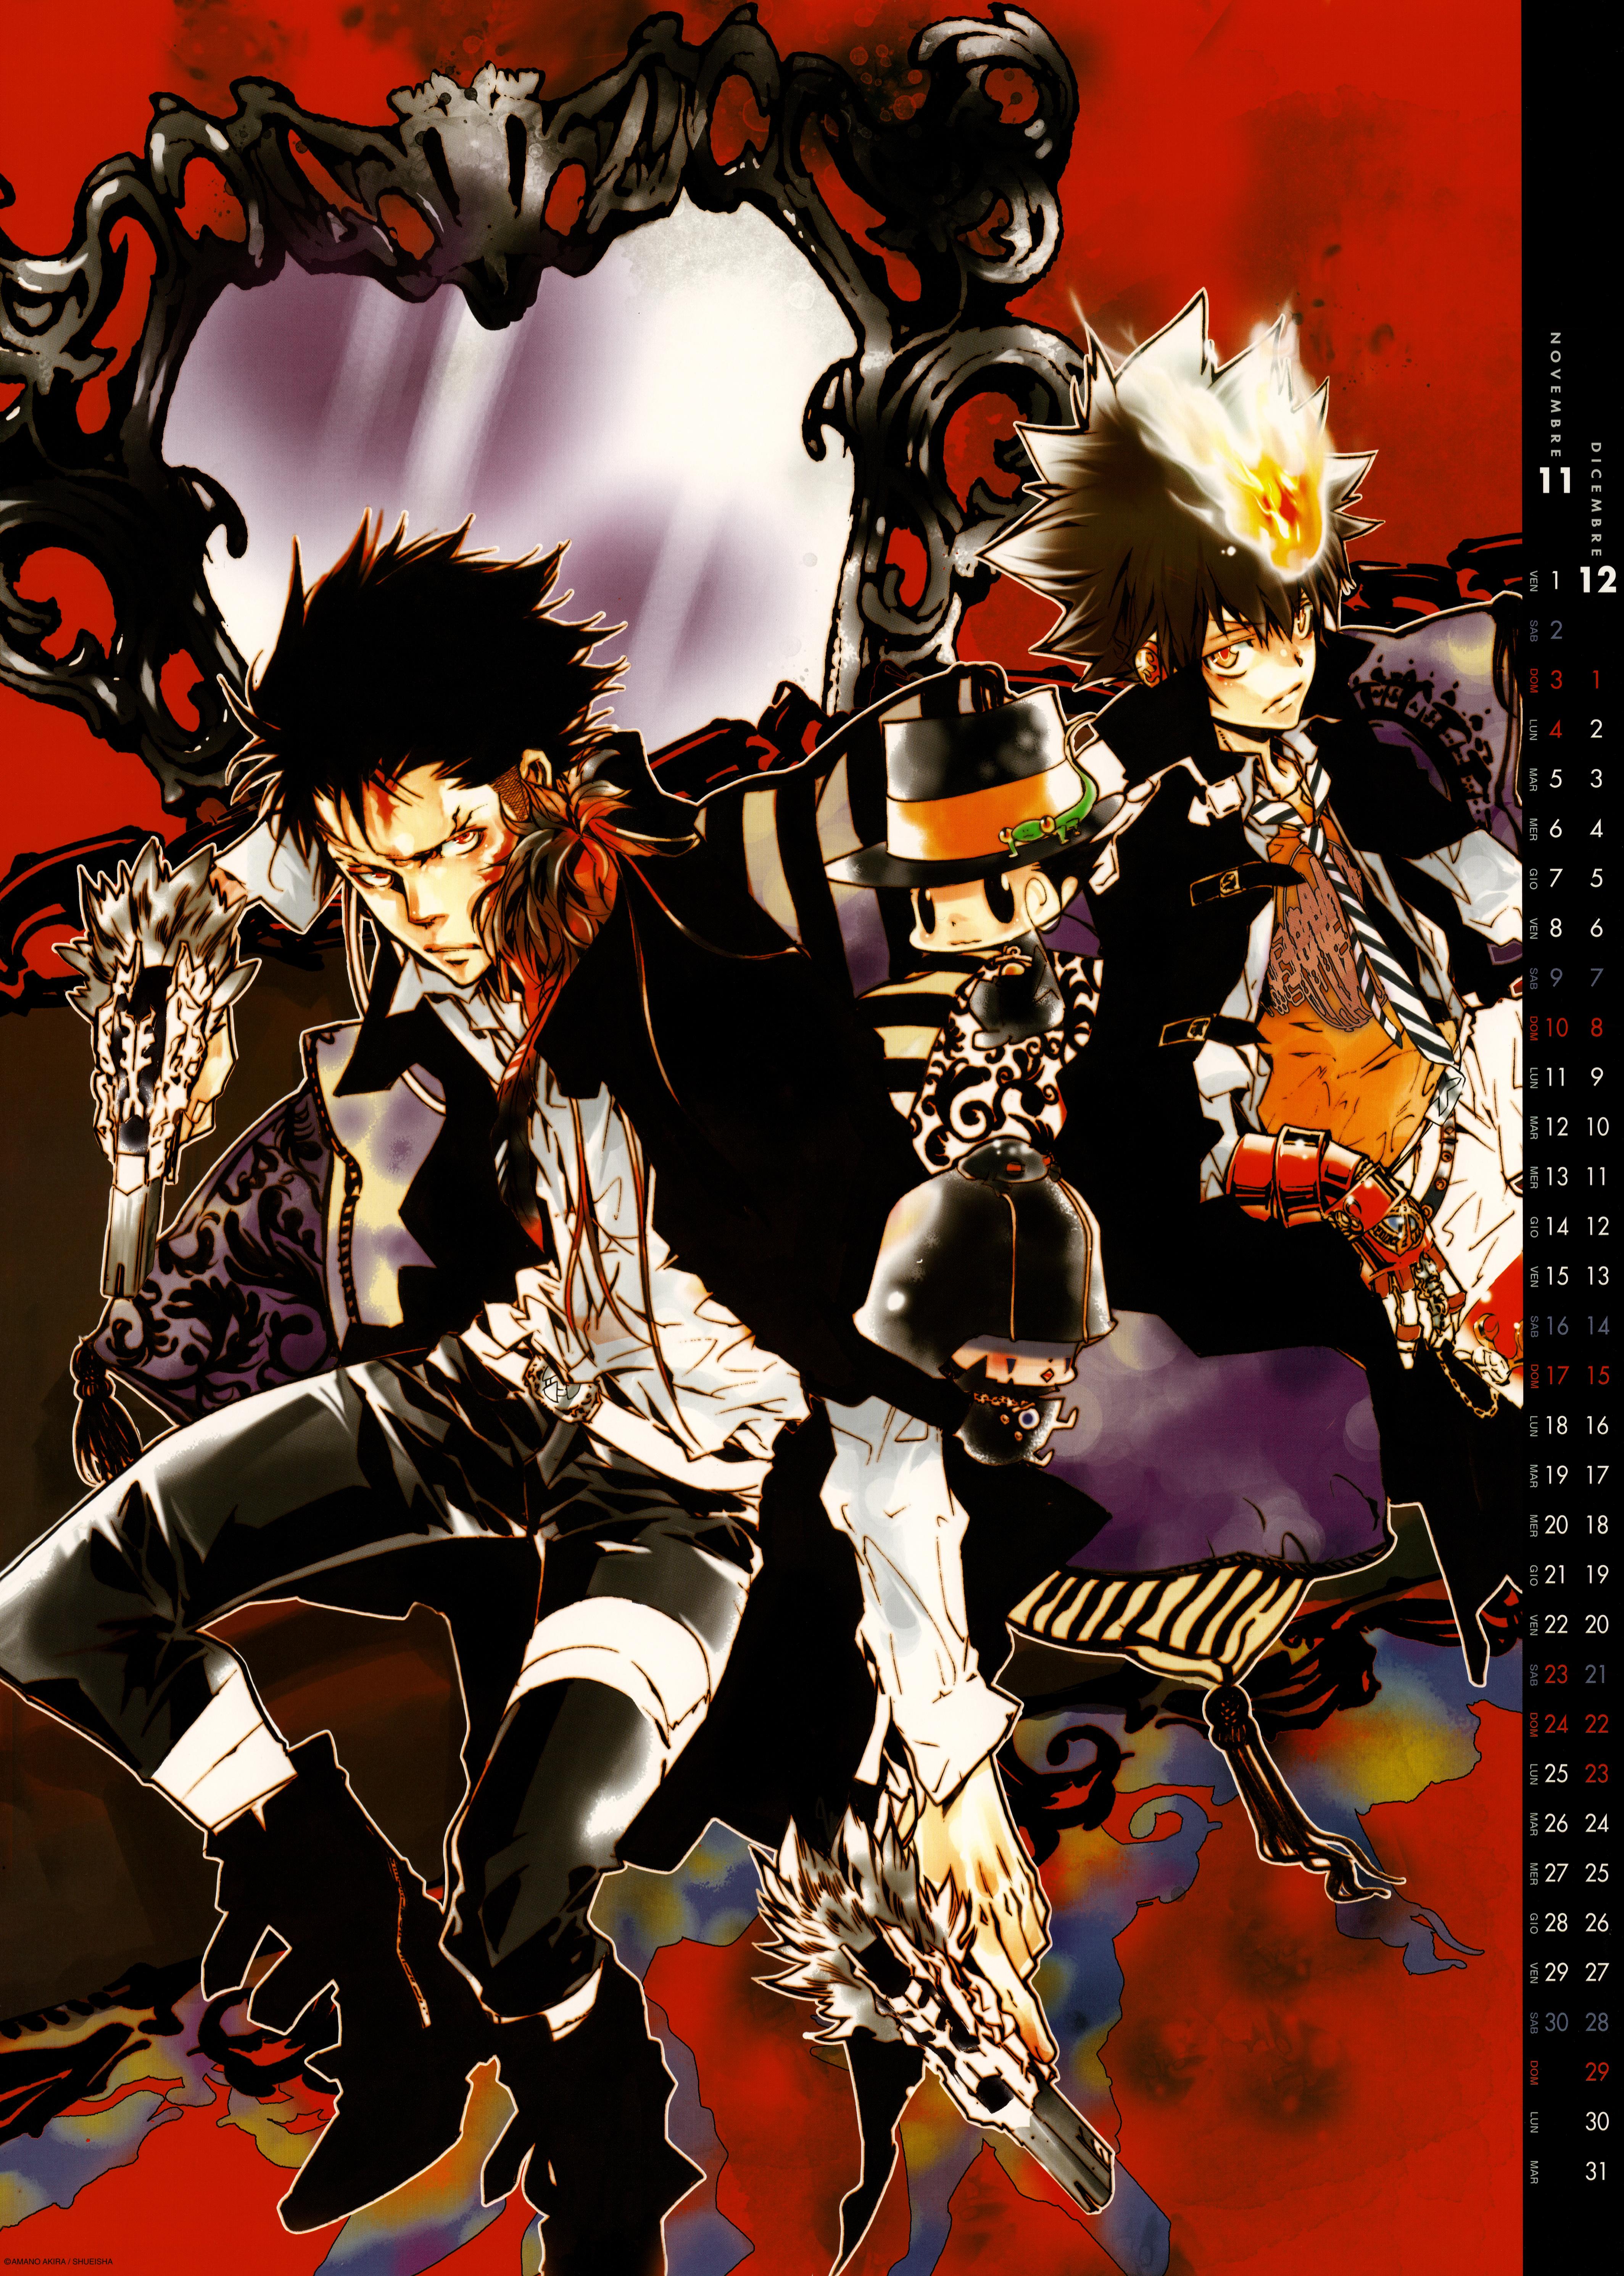 Katekyo Hitman Reborn Manga Cover Zerochan Anime Image Board